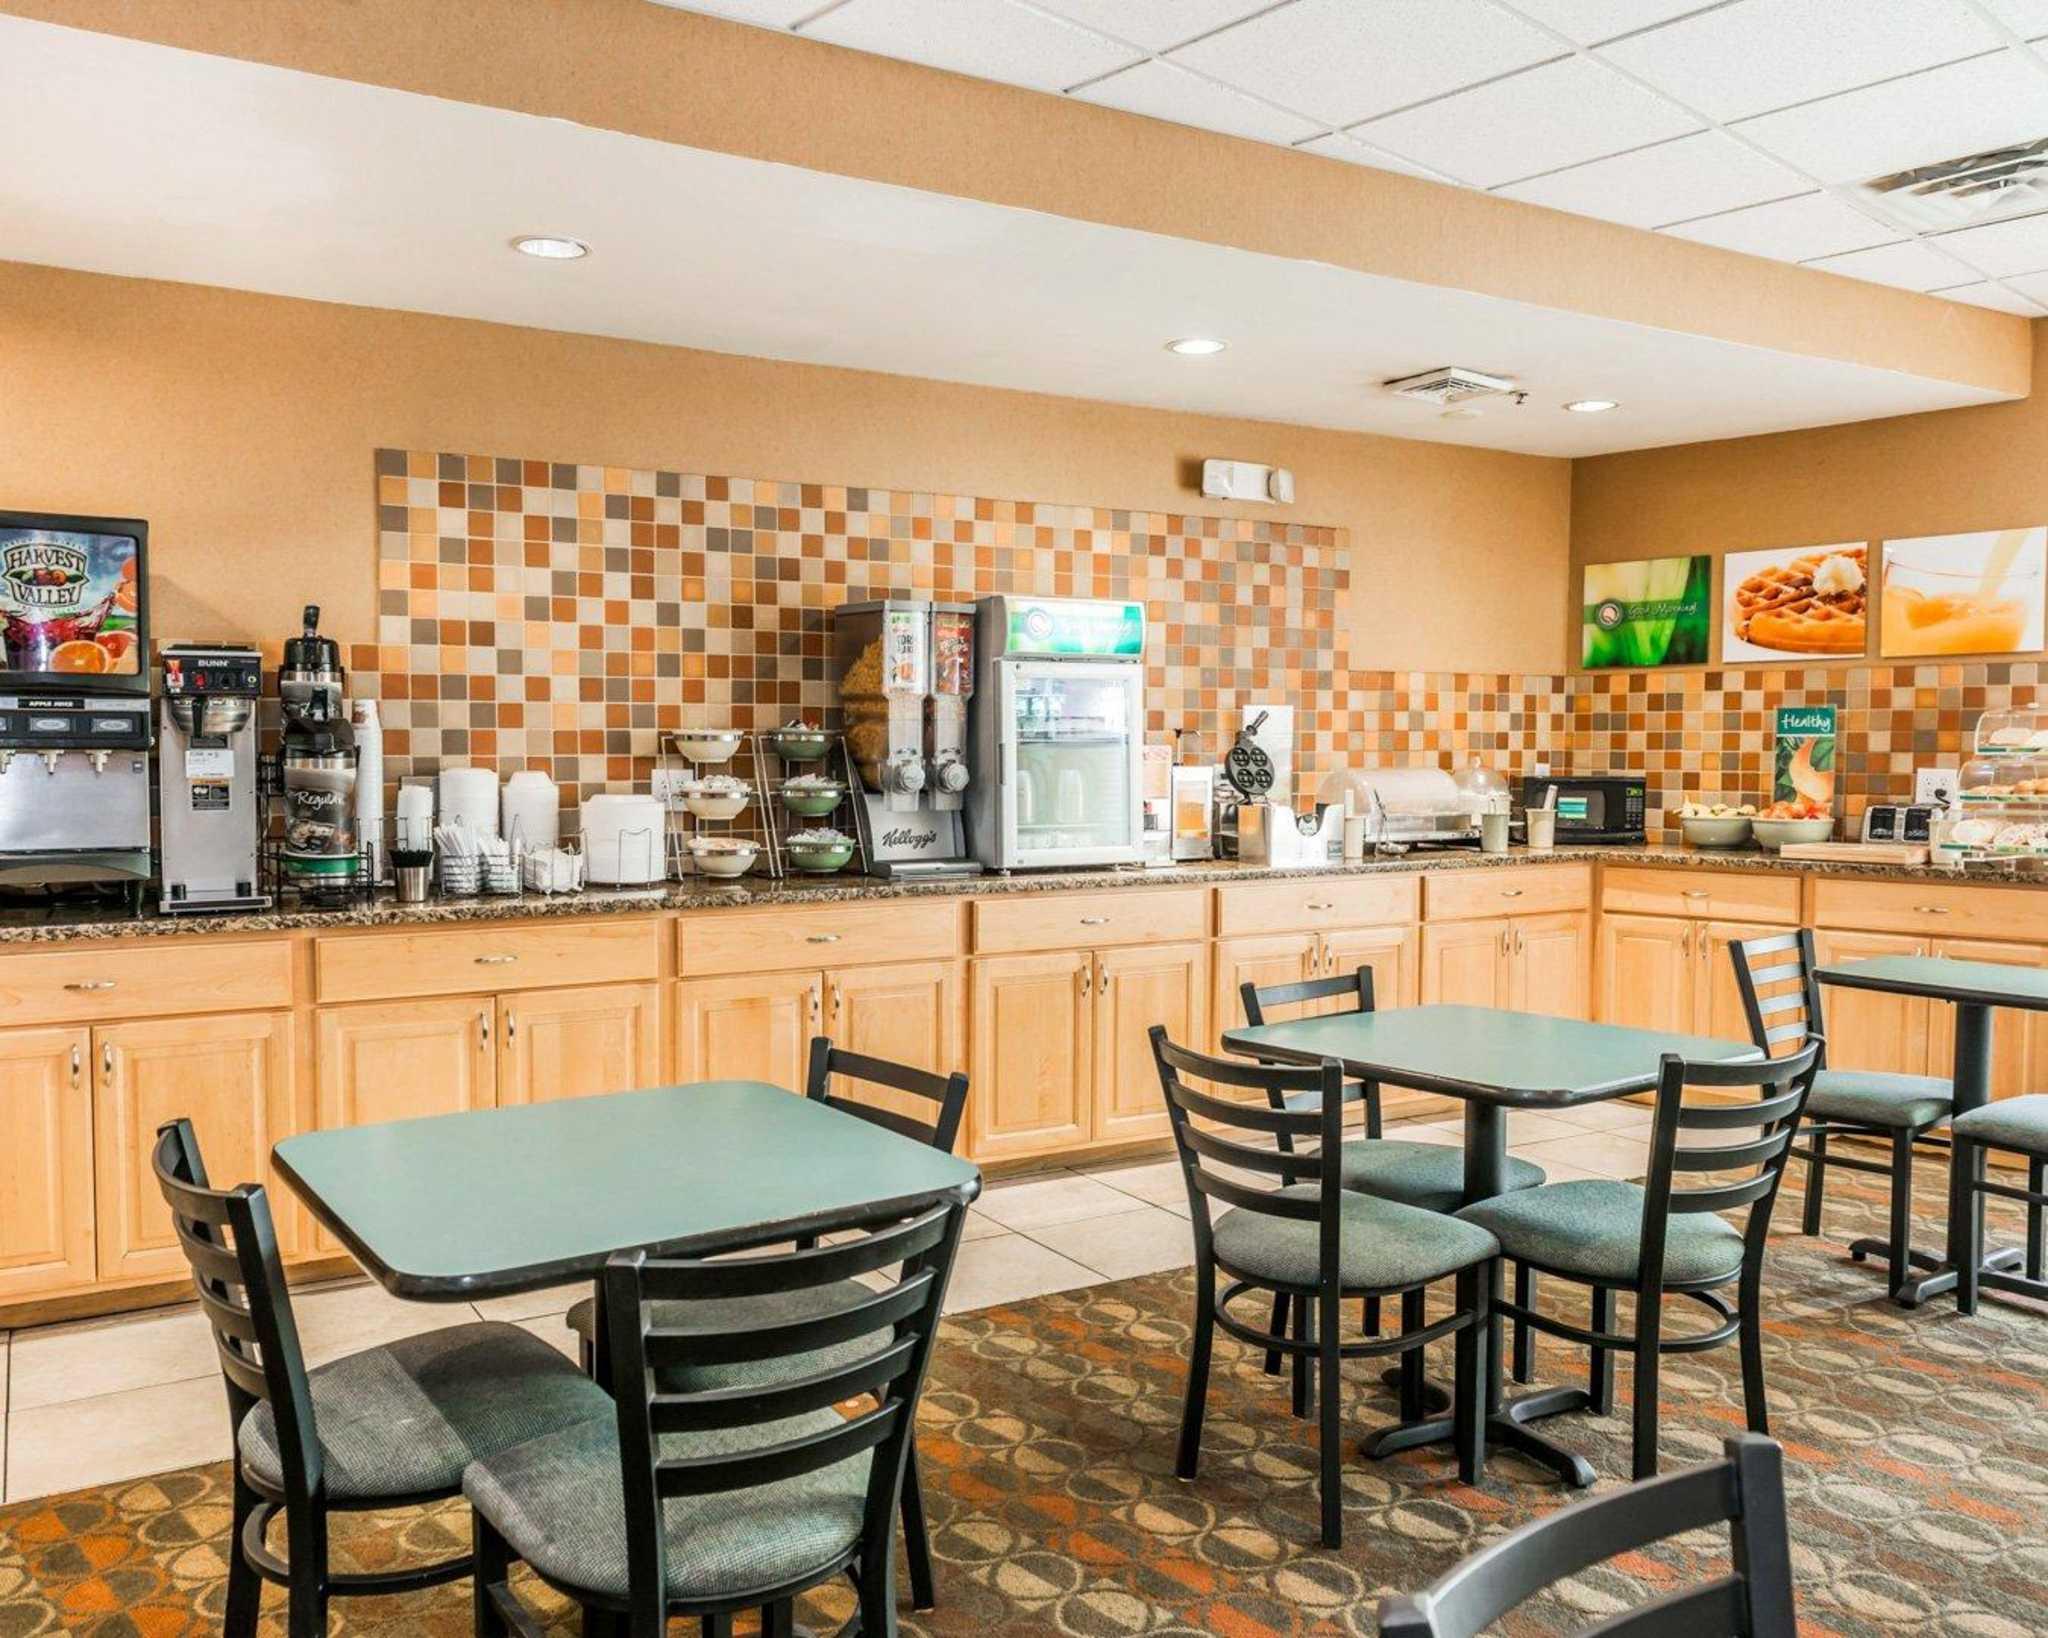 Quality Inn East image 21